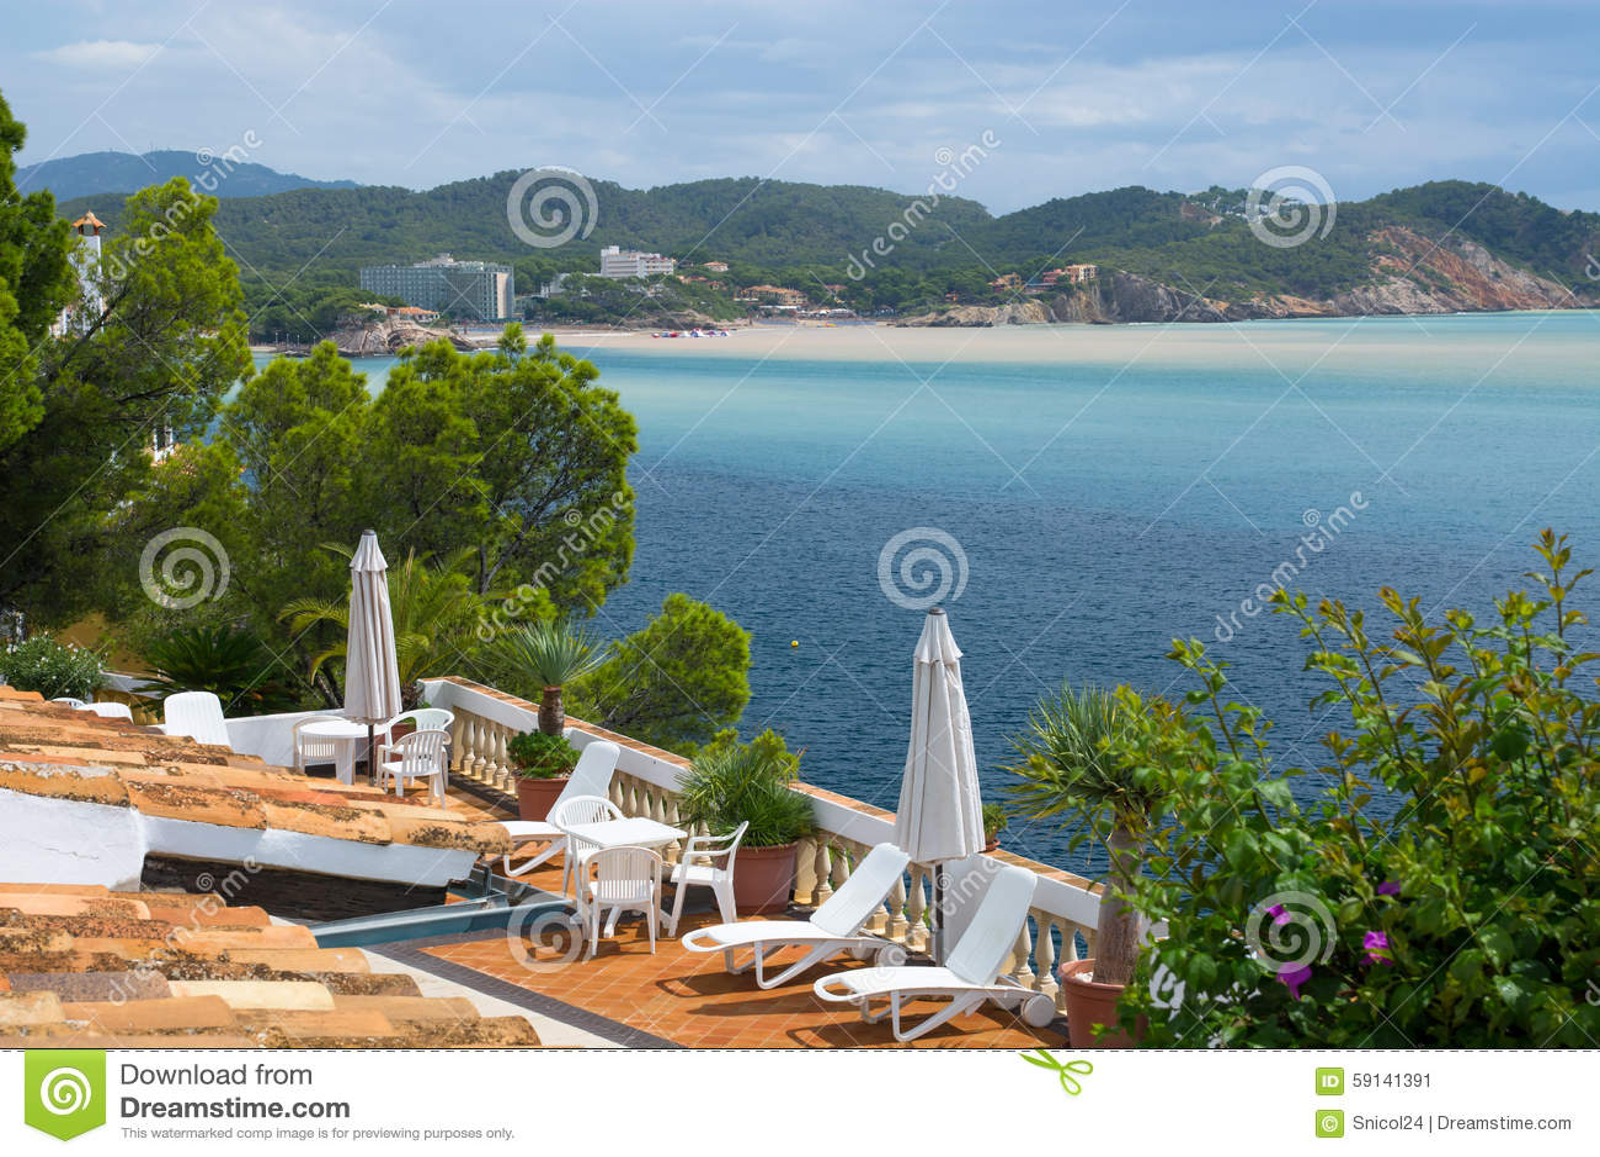 Sommer Hause-Landhaus terace sunbeds an der Mallorca-Seeseite